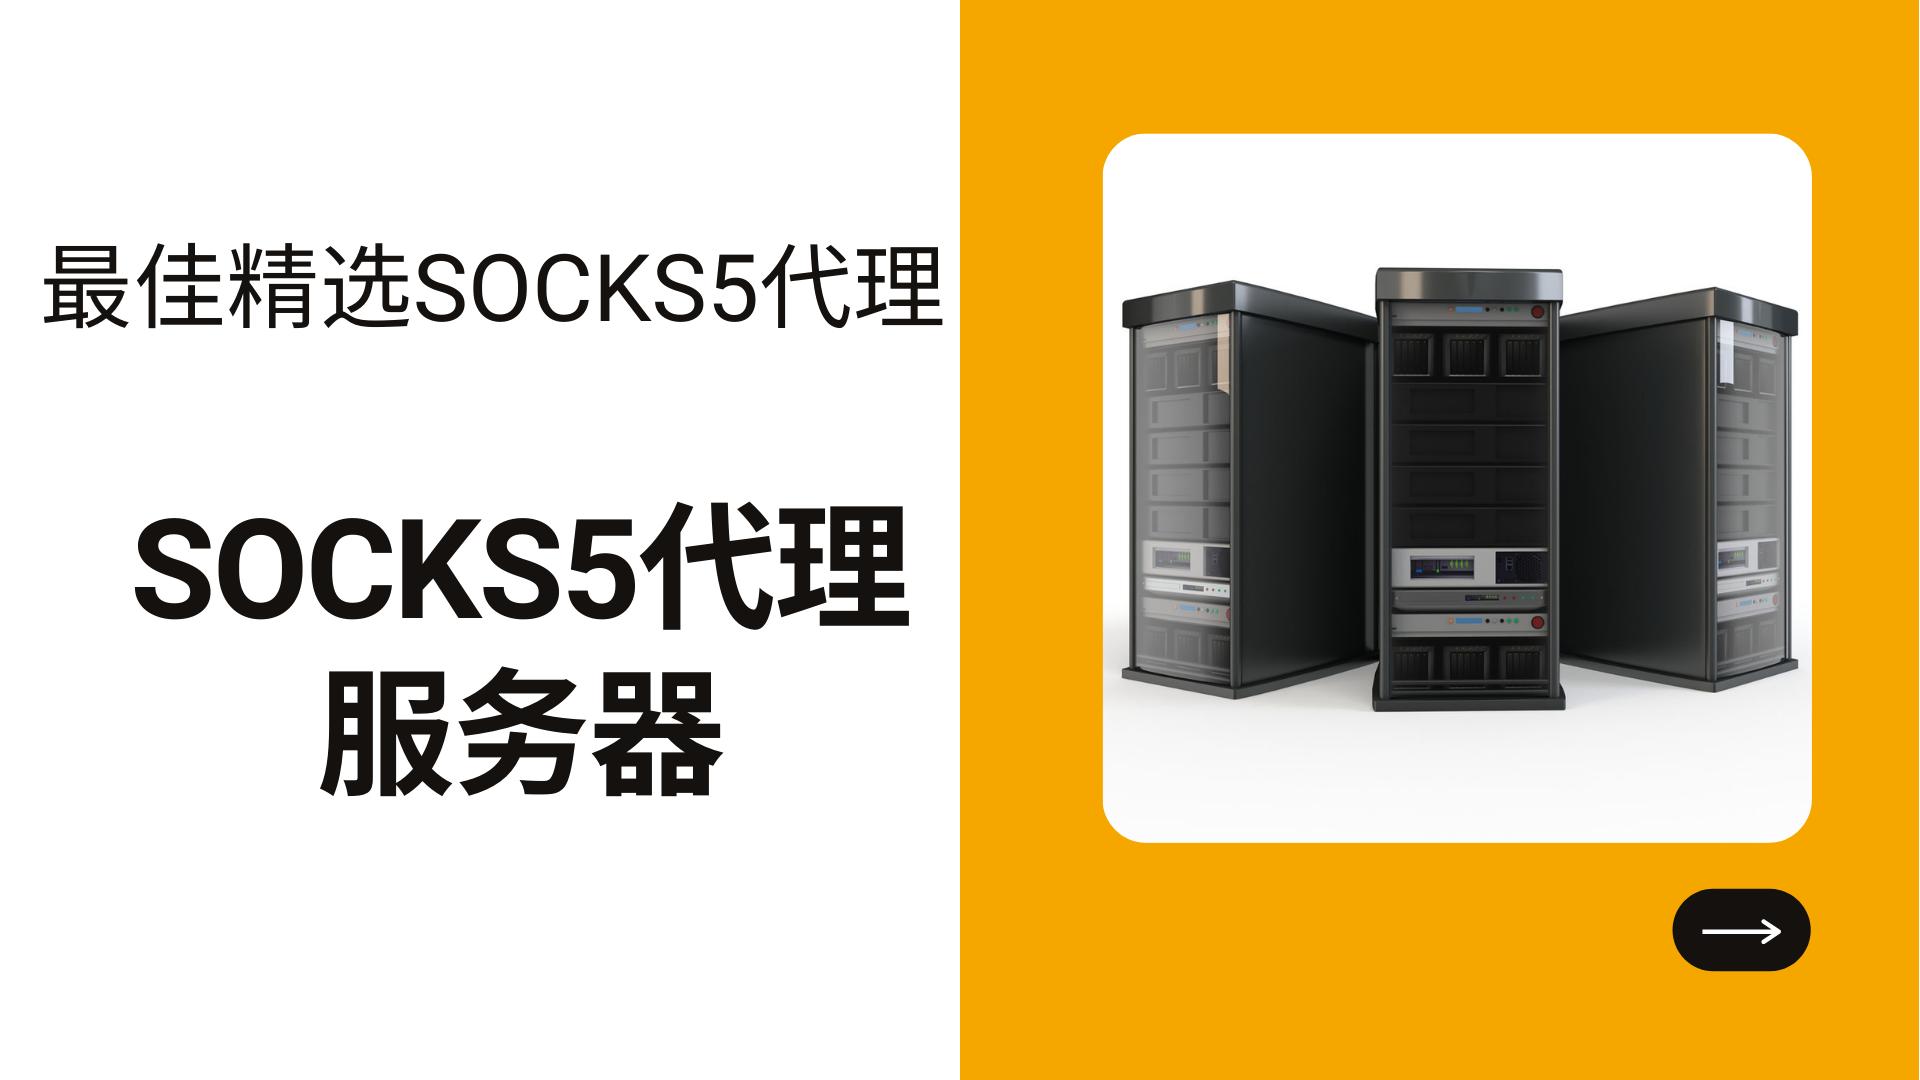 SOCKS5代理服务器